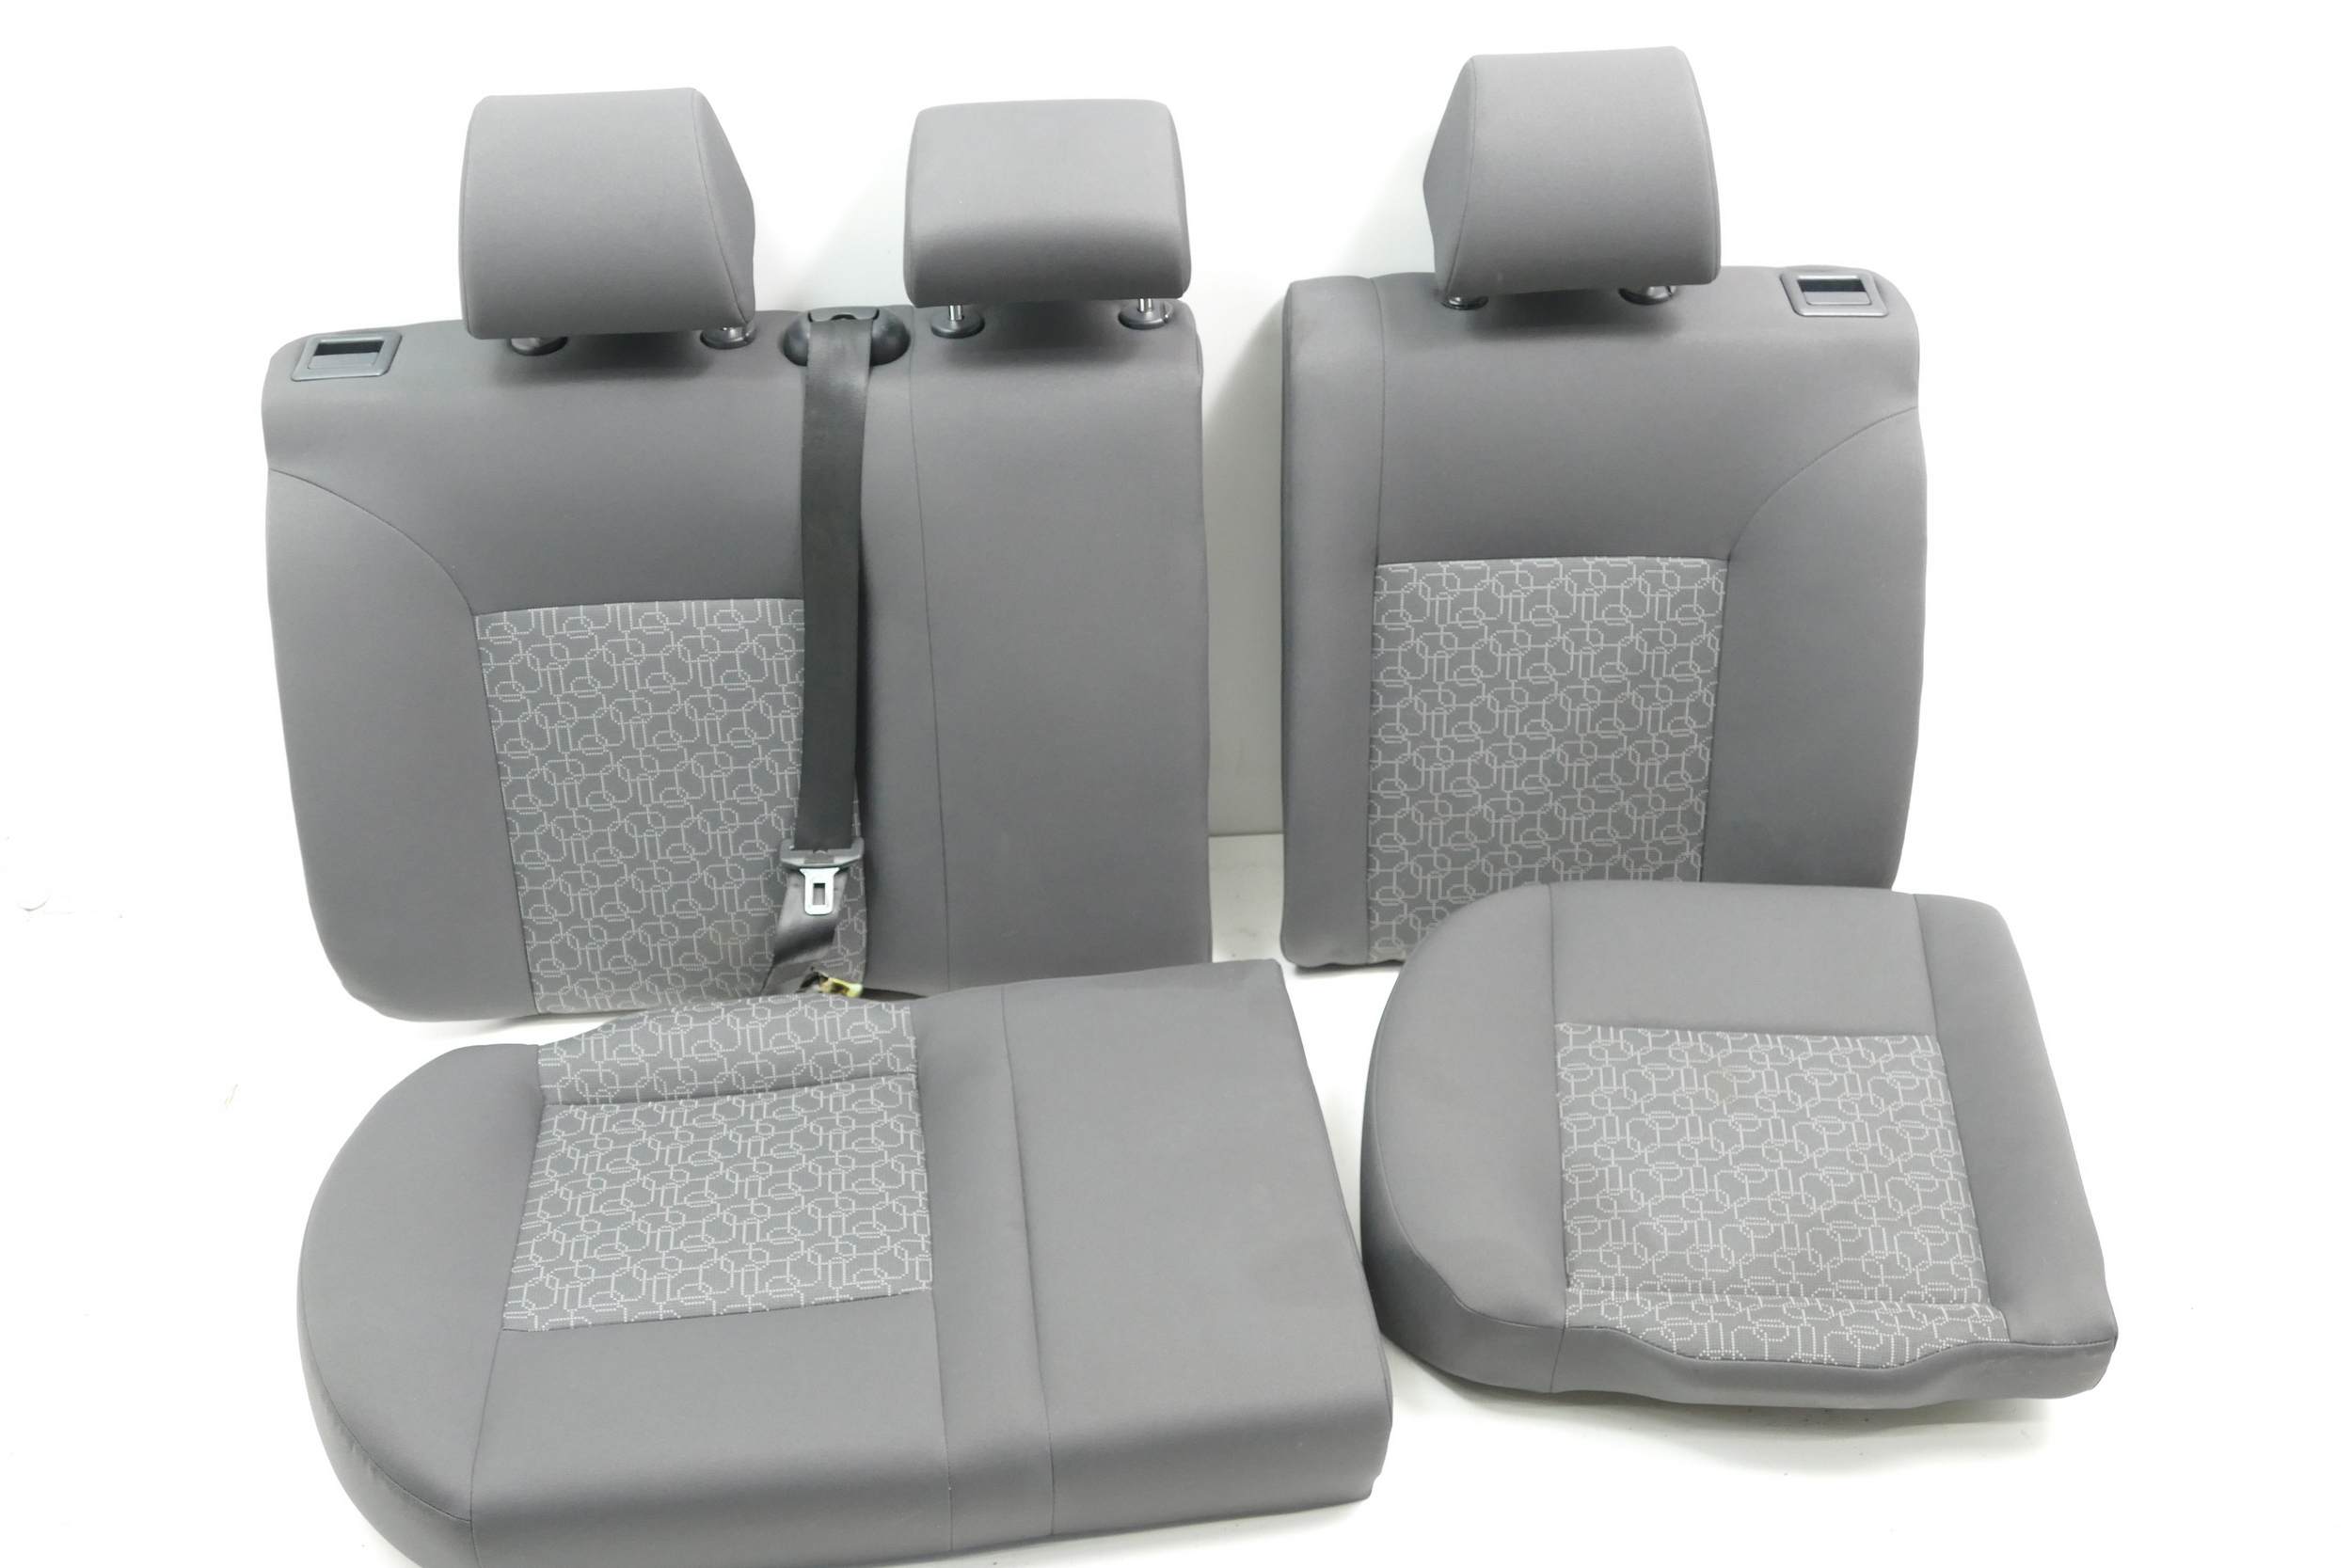 seat ibiza 6l r ckbank r cksitzbank sitz kopfst tze. Black Bedroom Furniture Sets. Home Design Ideas